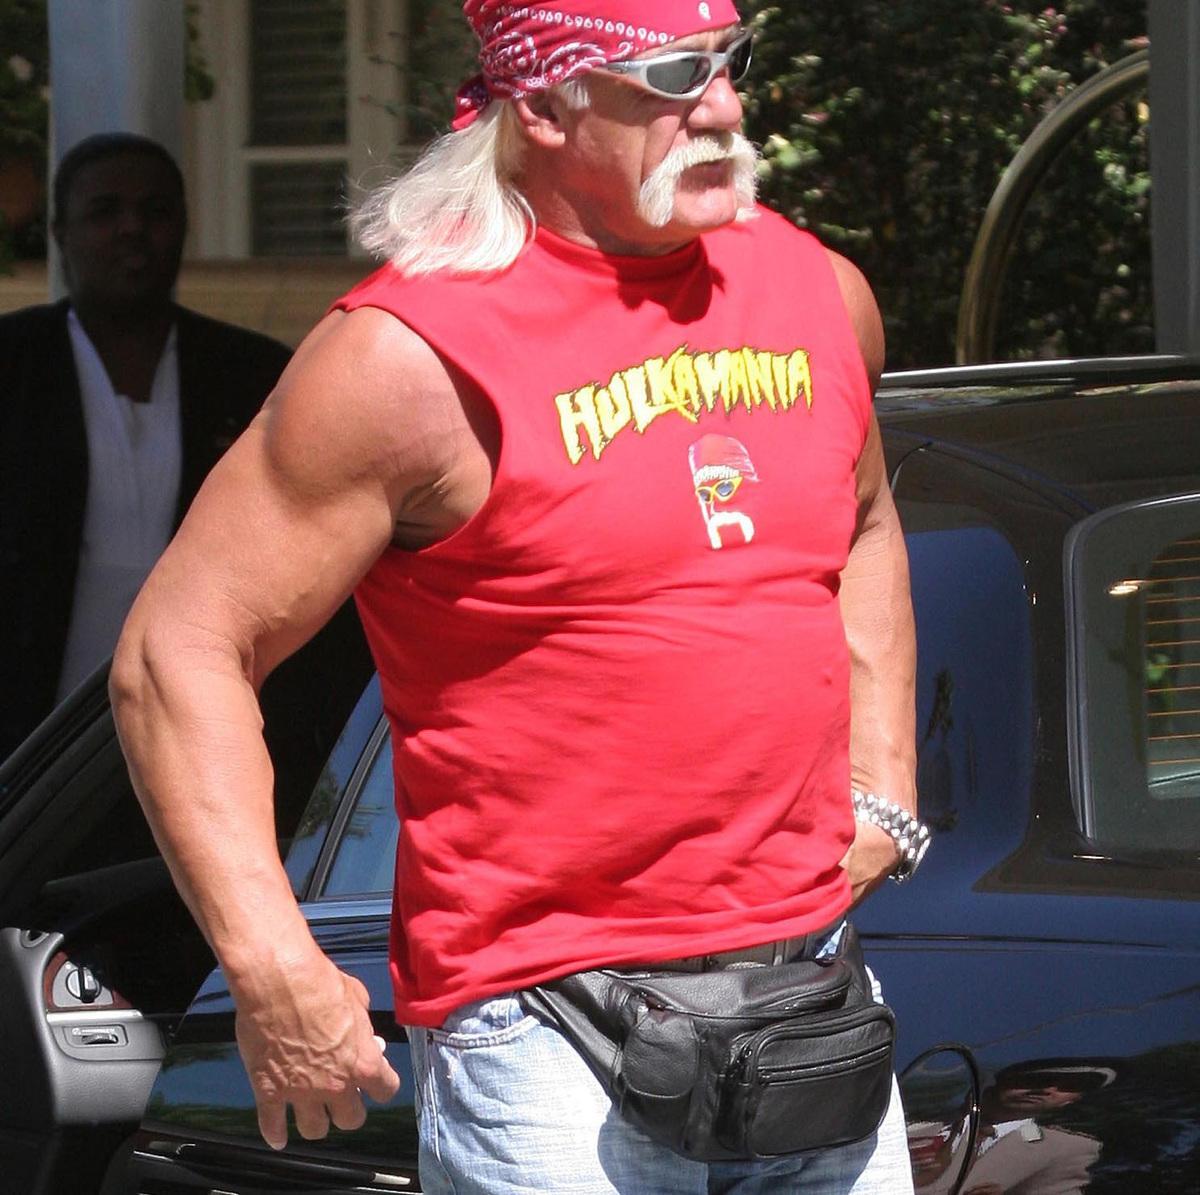 hulk hogan wearing a fanny pack